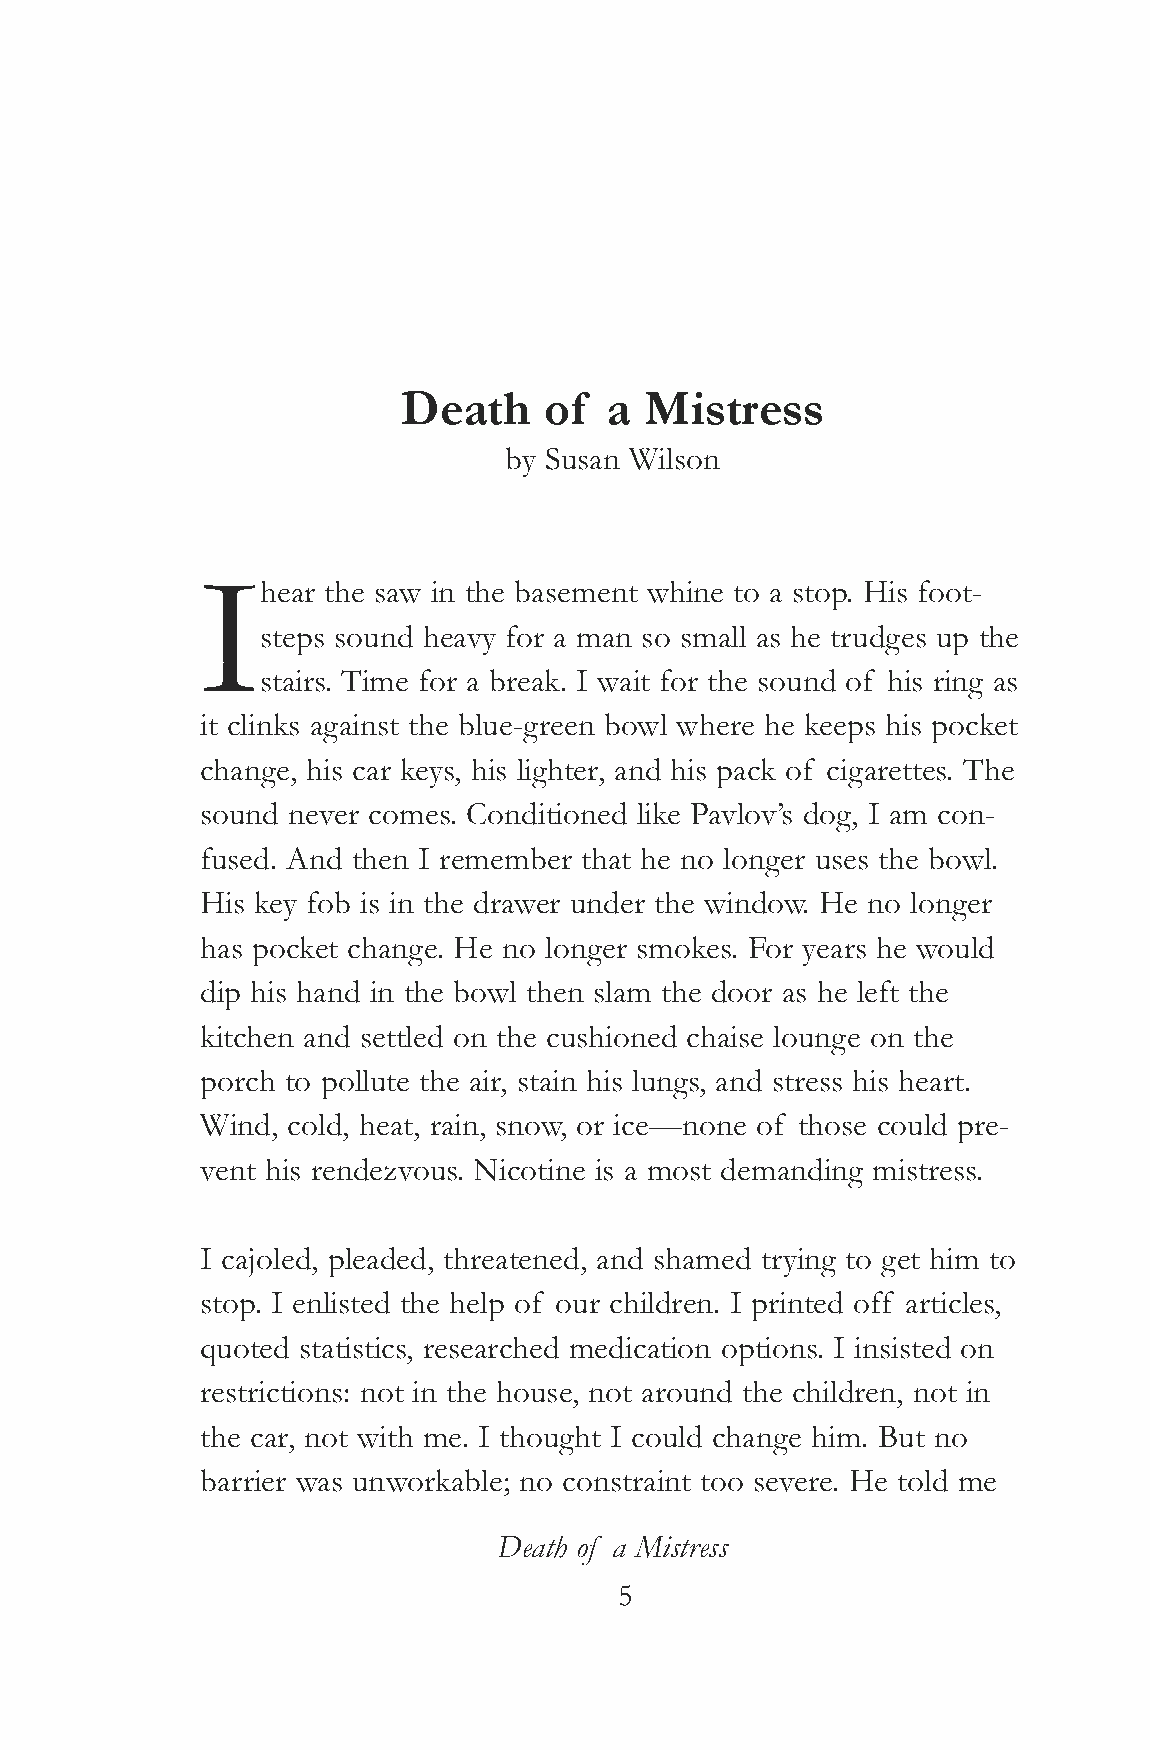 Death of a Mistress - p 5.png